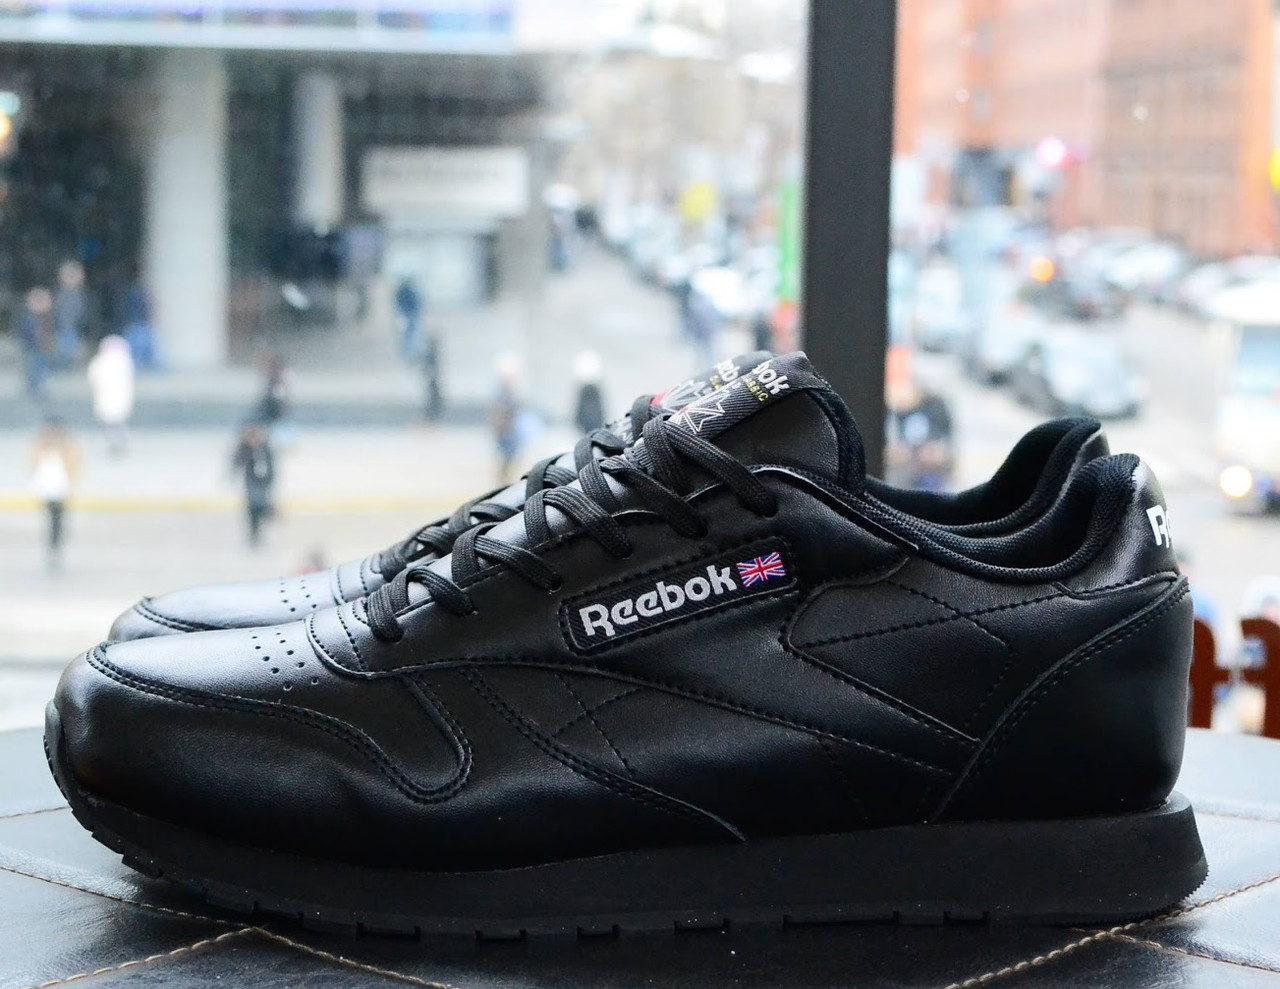 80b63af1 Кроссовки Reebok Classic Black. Топ качество. Живое фото! (Реплика ААА+)